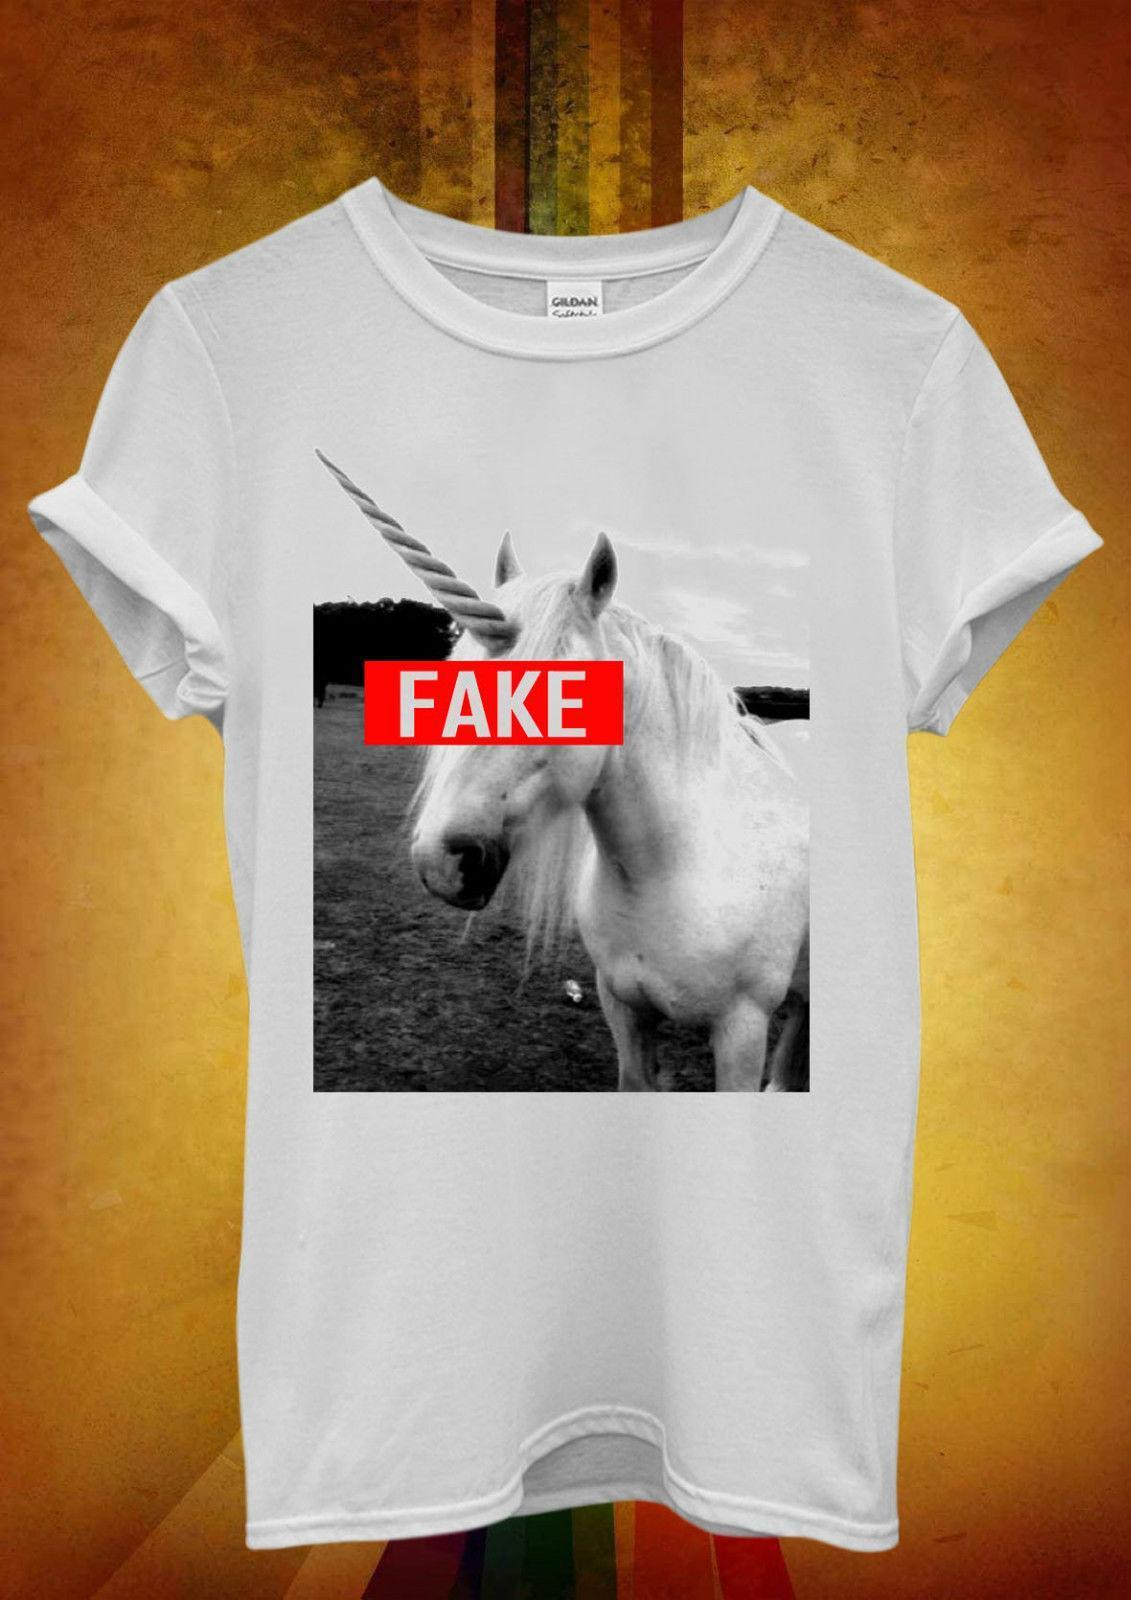 Falso Divertido Mujeres Unicornio Camiseta Unisex Hipster 908 Hombres Mangas Fresco Chaleco Sin OPXikuZ